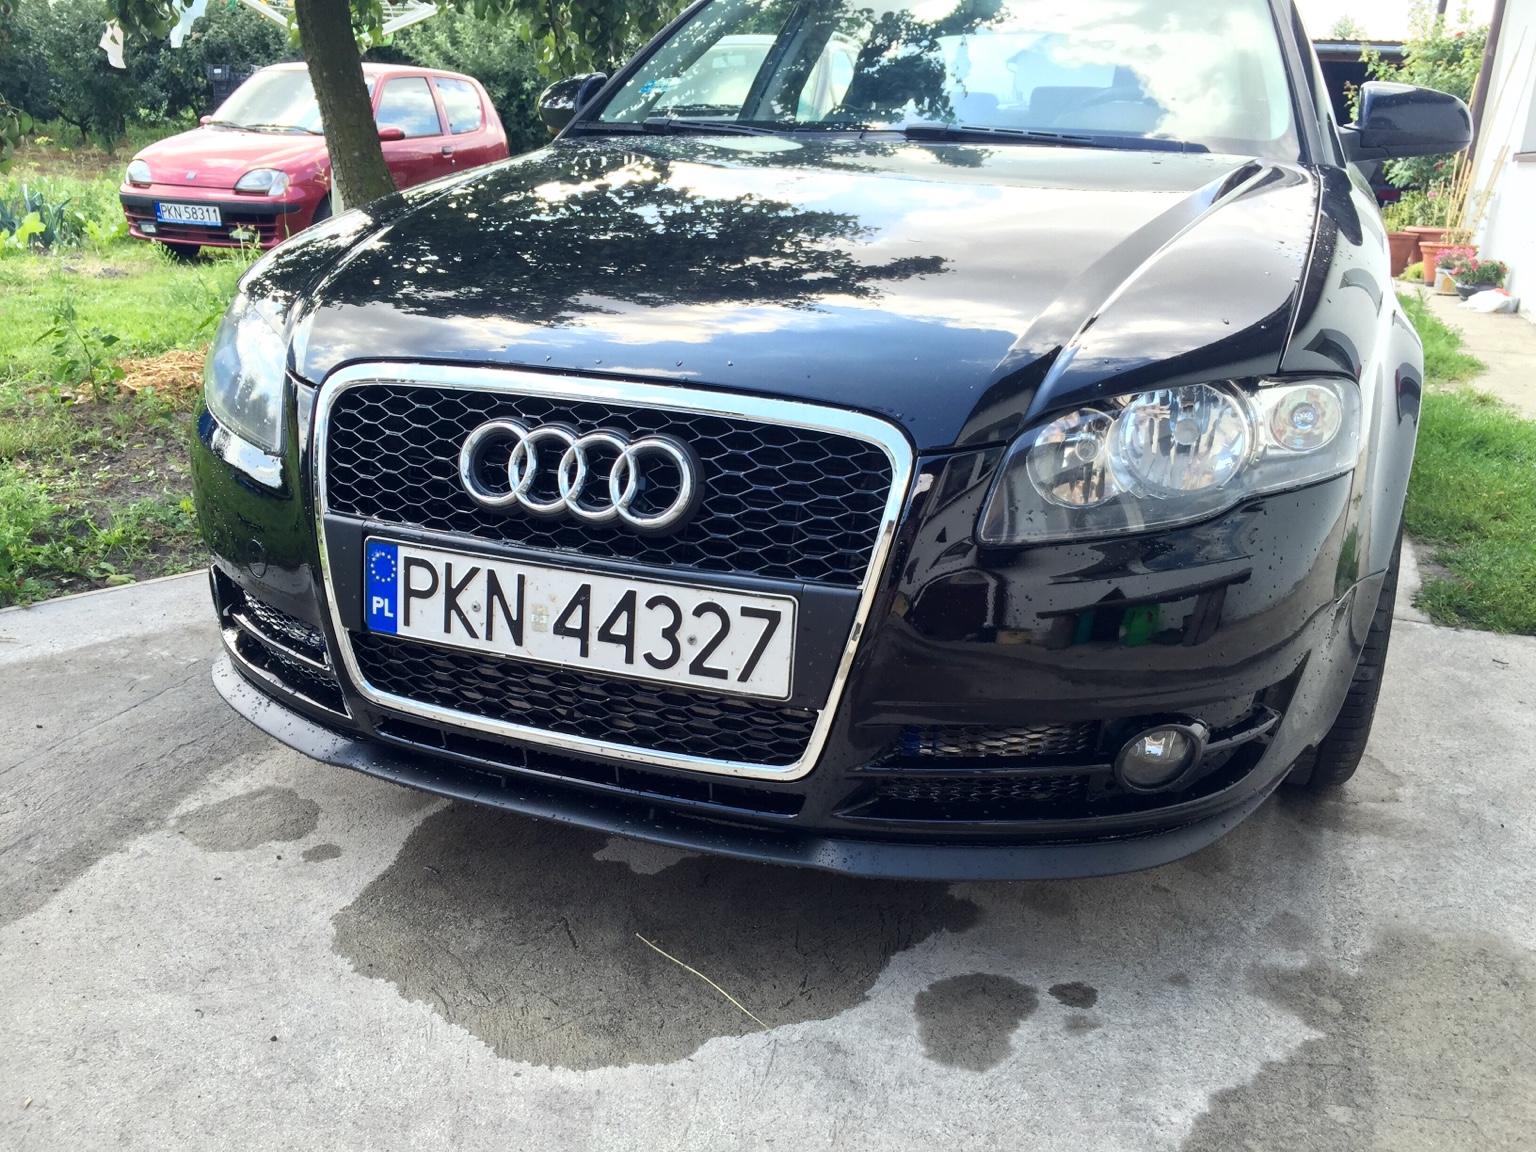 Plaster Miodu Ori Zderzak A4 B7 Audi A4 Klub Polska